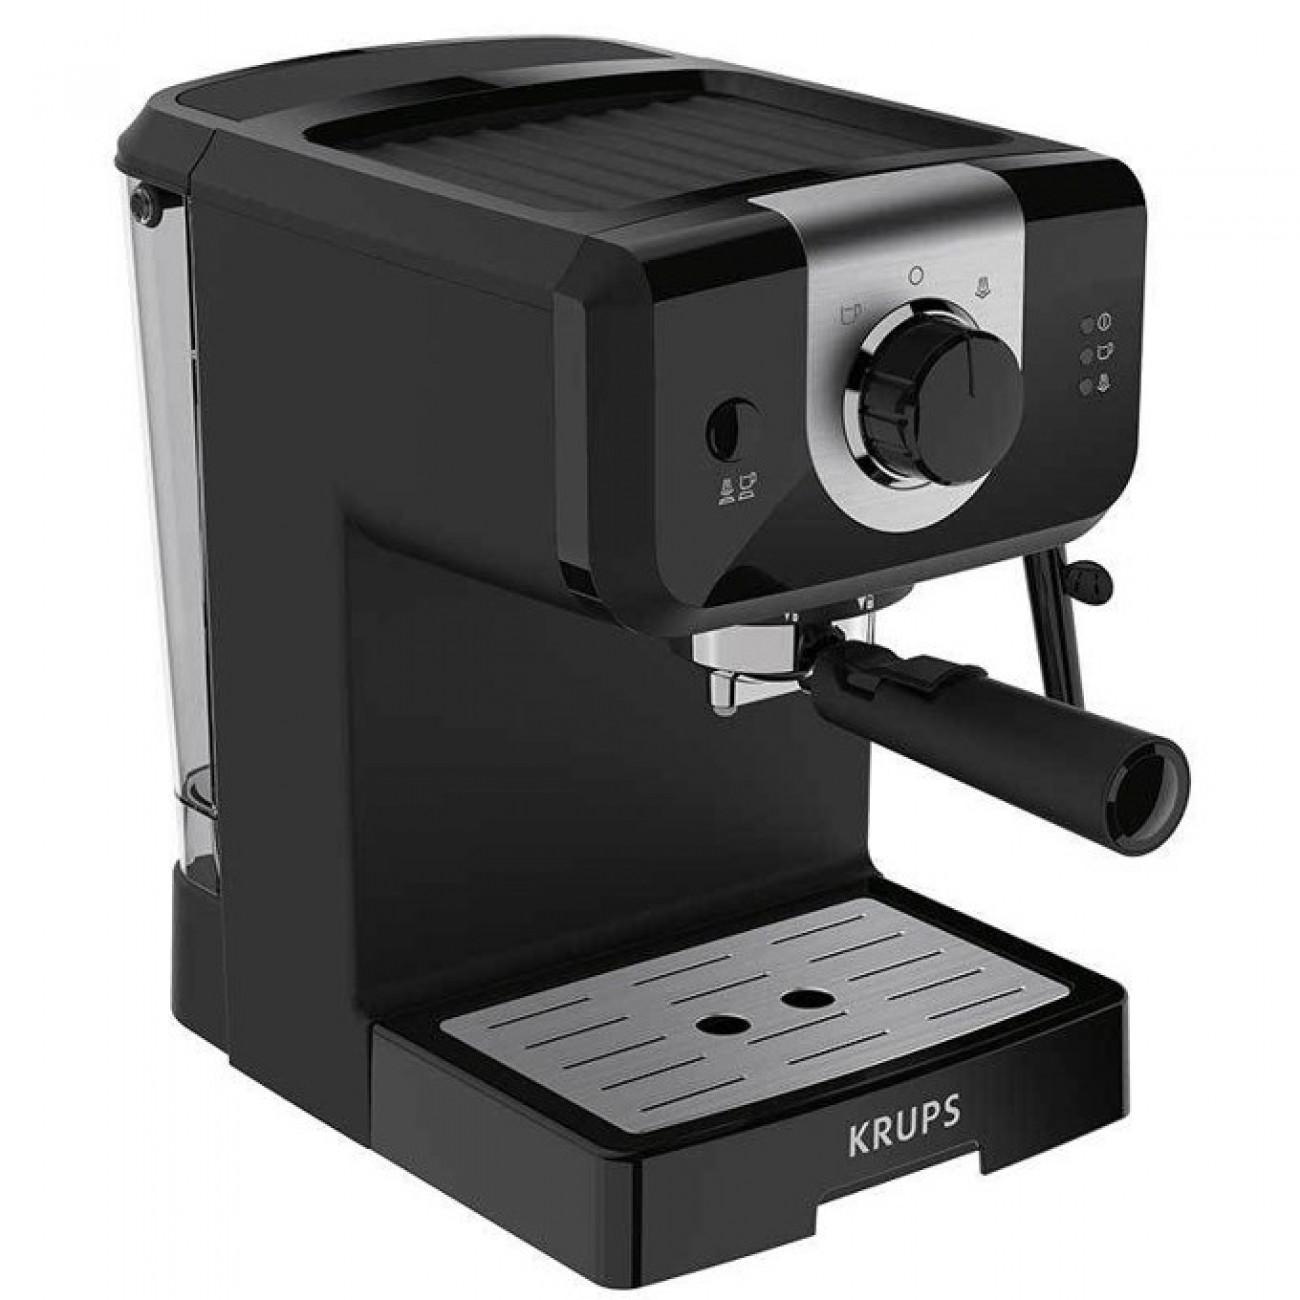 Кафемашина Krups XP320830, 1050W, 15 bar, черен в Еспресо машини - KRUPS | Alleop